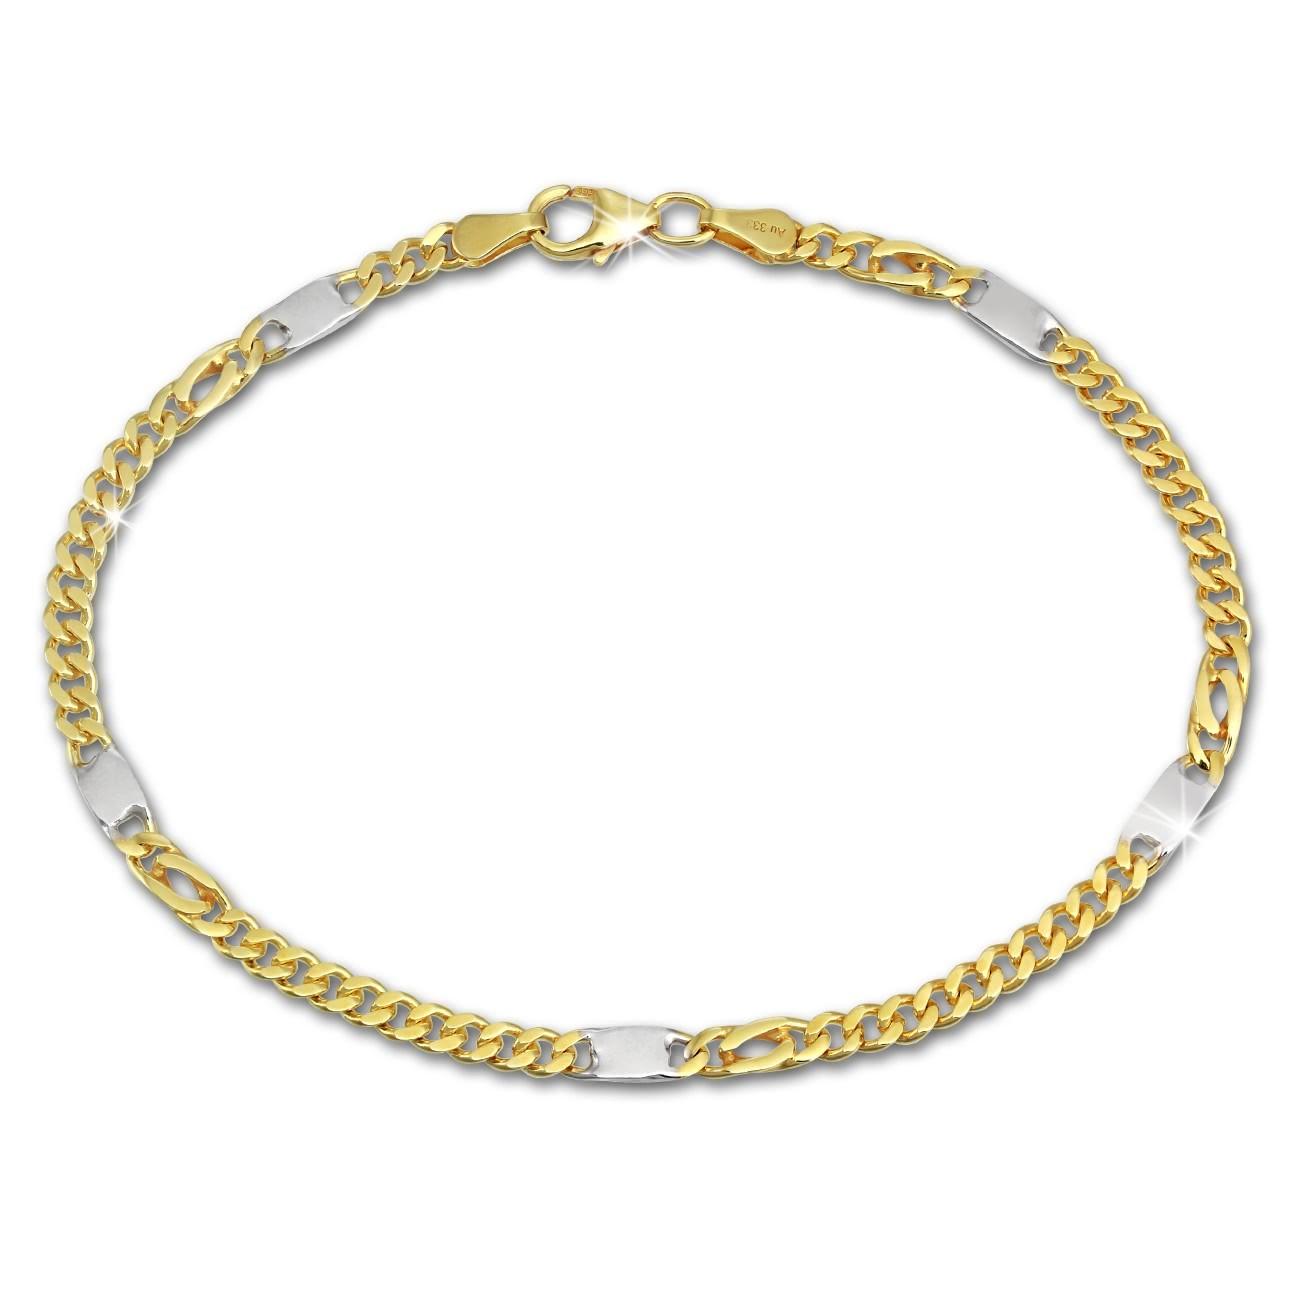 SilberDream Armband Tigerauge bicolor 333 Gold 19cm 8 Karat GDA0299T